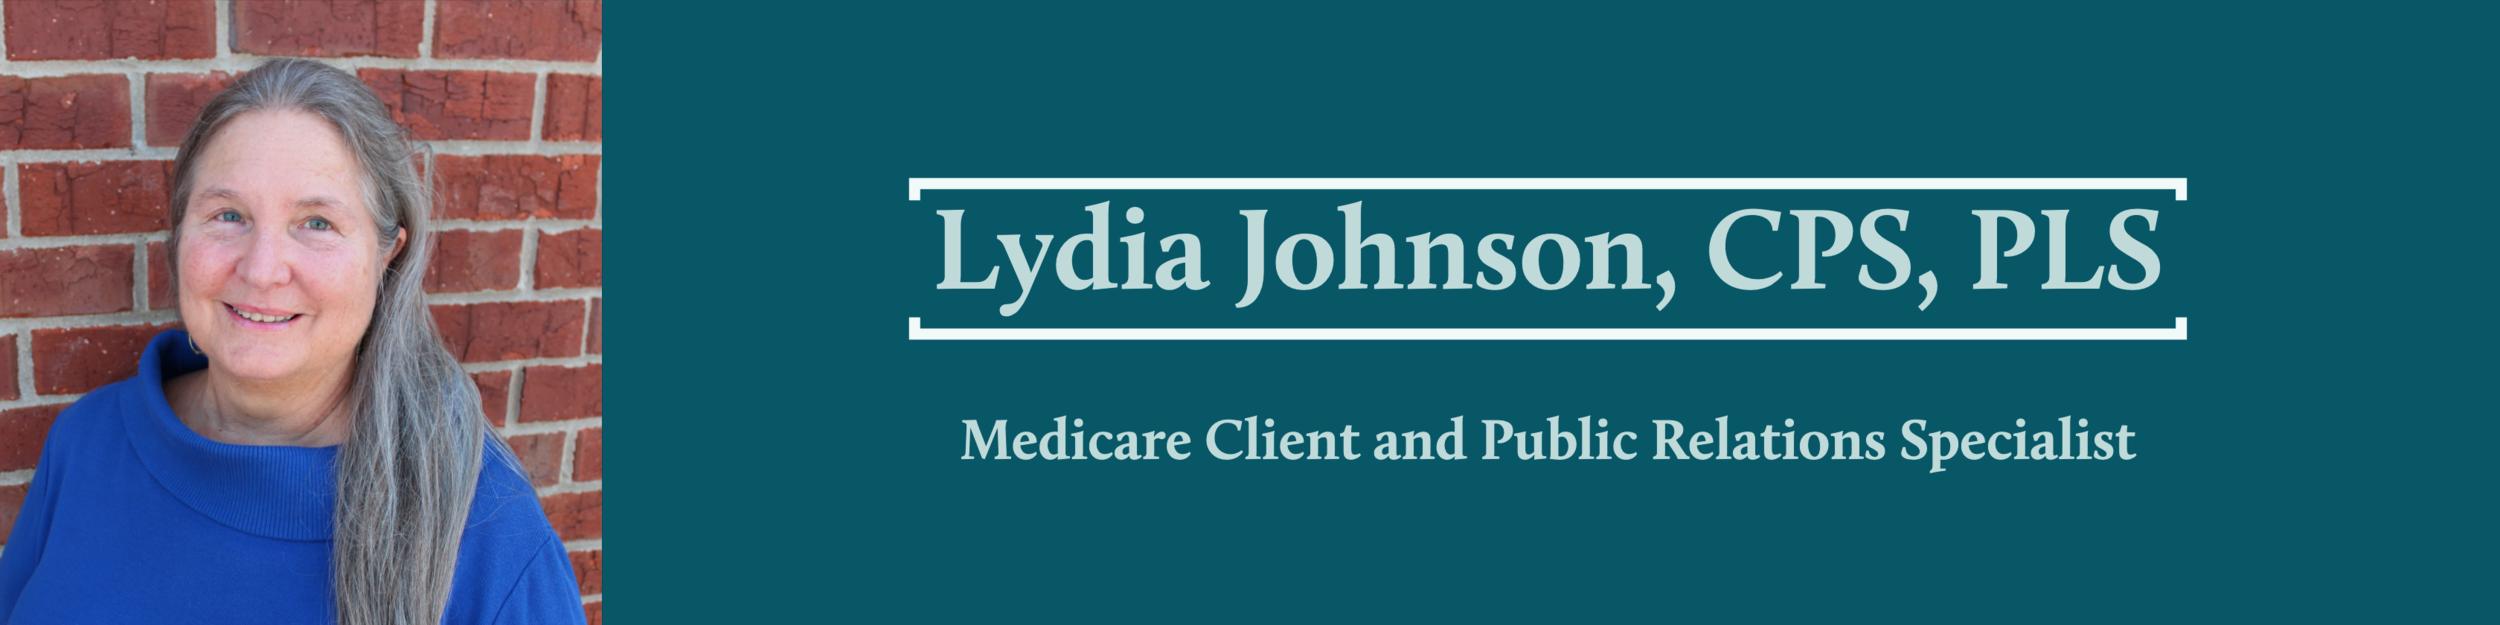 Lydia Johnson Banner(1).png